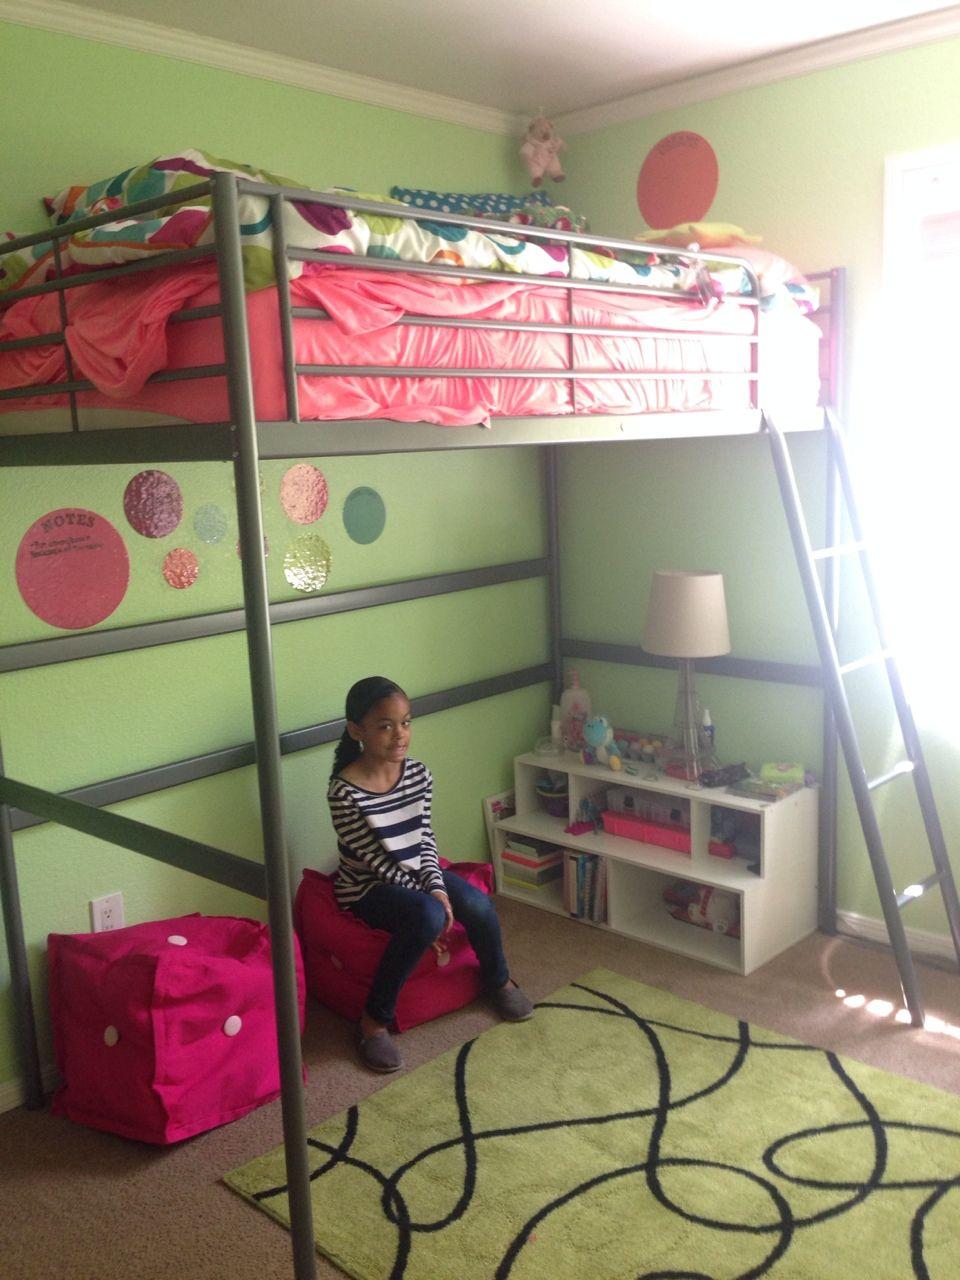 ikea svarta google search household boys rooms pinterest ikea kids kids rooms and room. Black Bedroom Furniture Sets. Home Design Ideas